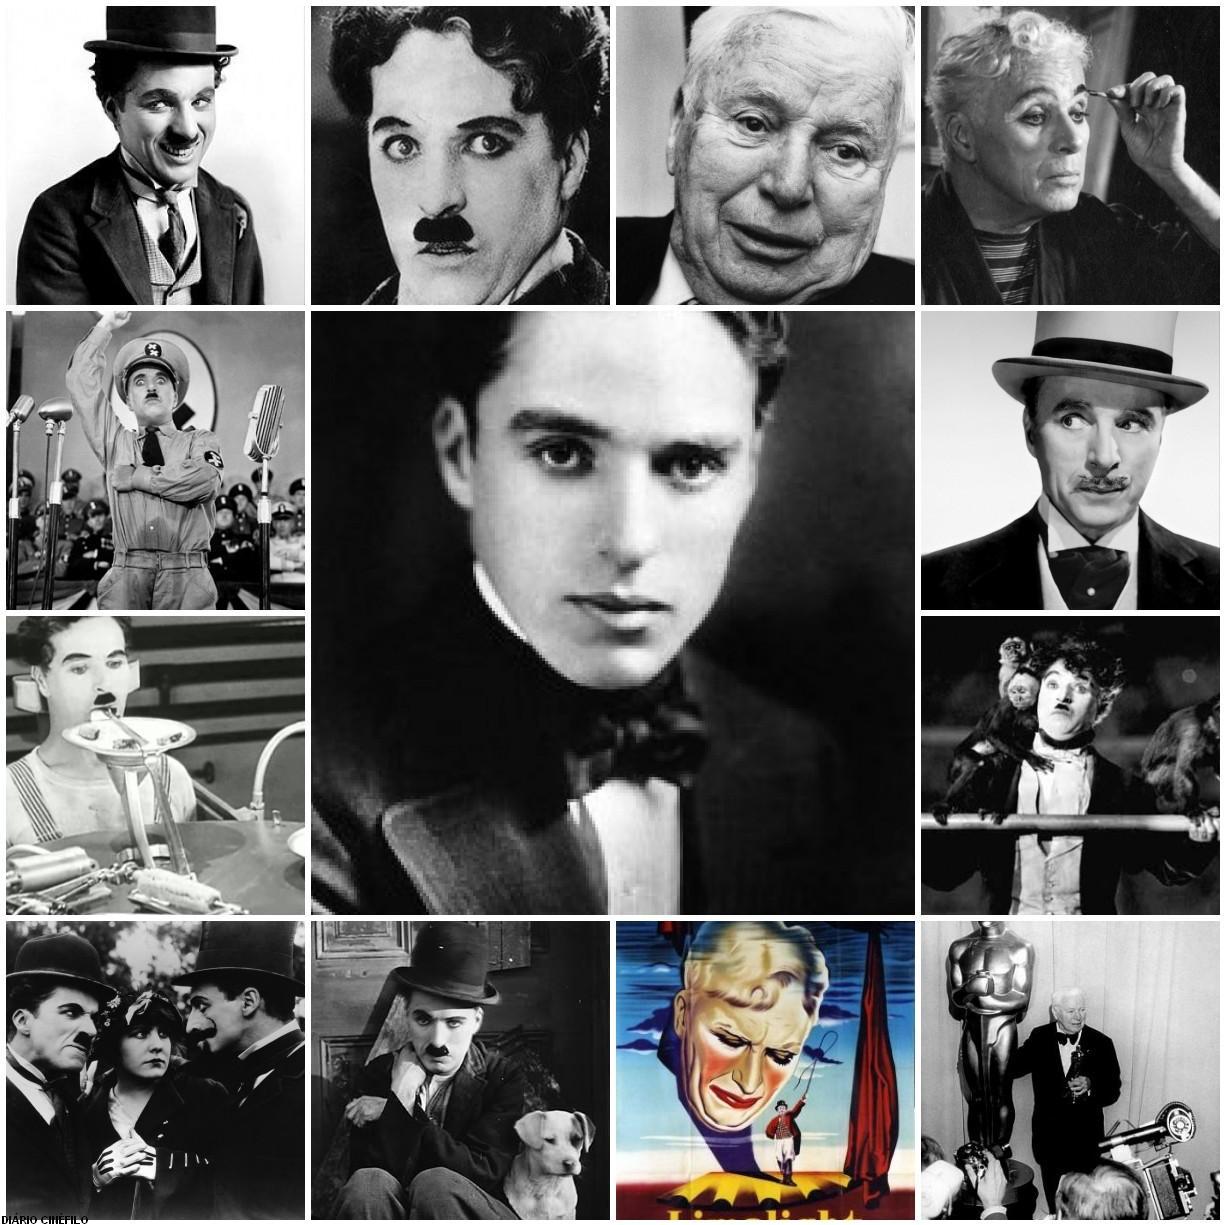 http://2.bp.blogspot.com/-QXsa33G9RWU/Tiyf4lu8-MI/AAAAAAAADdg/6tRo_7n5xjM/s1600/Charles+Chaplin+1.jpg